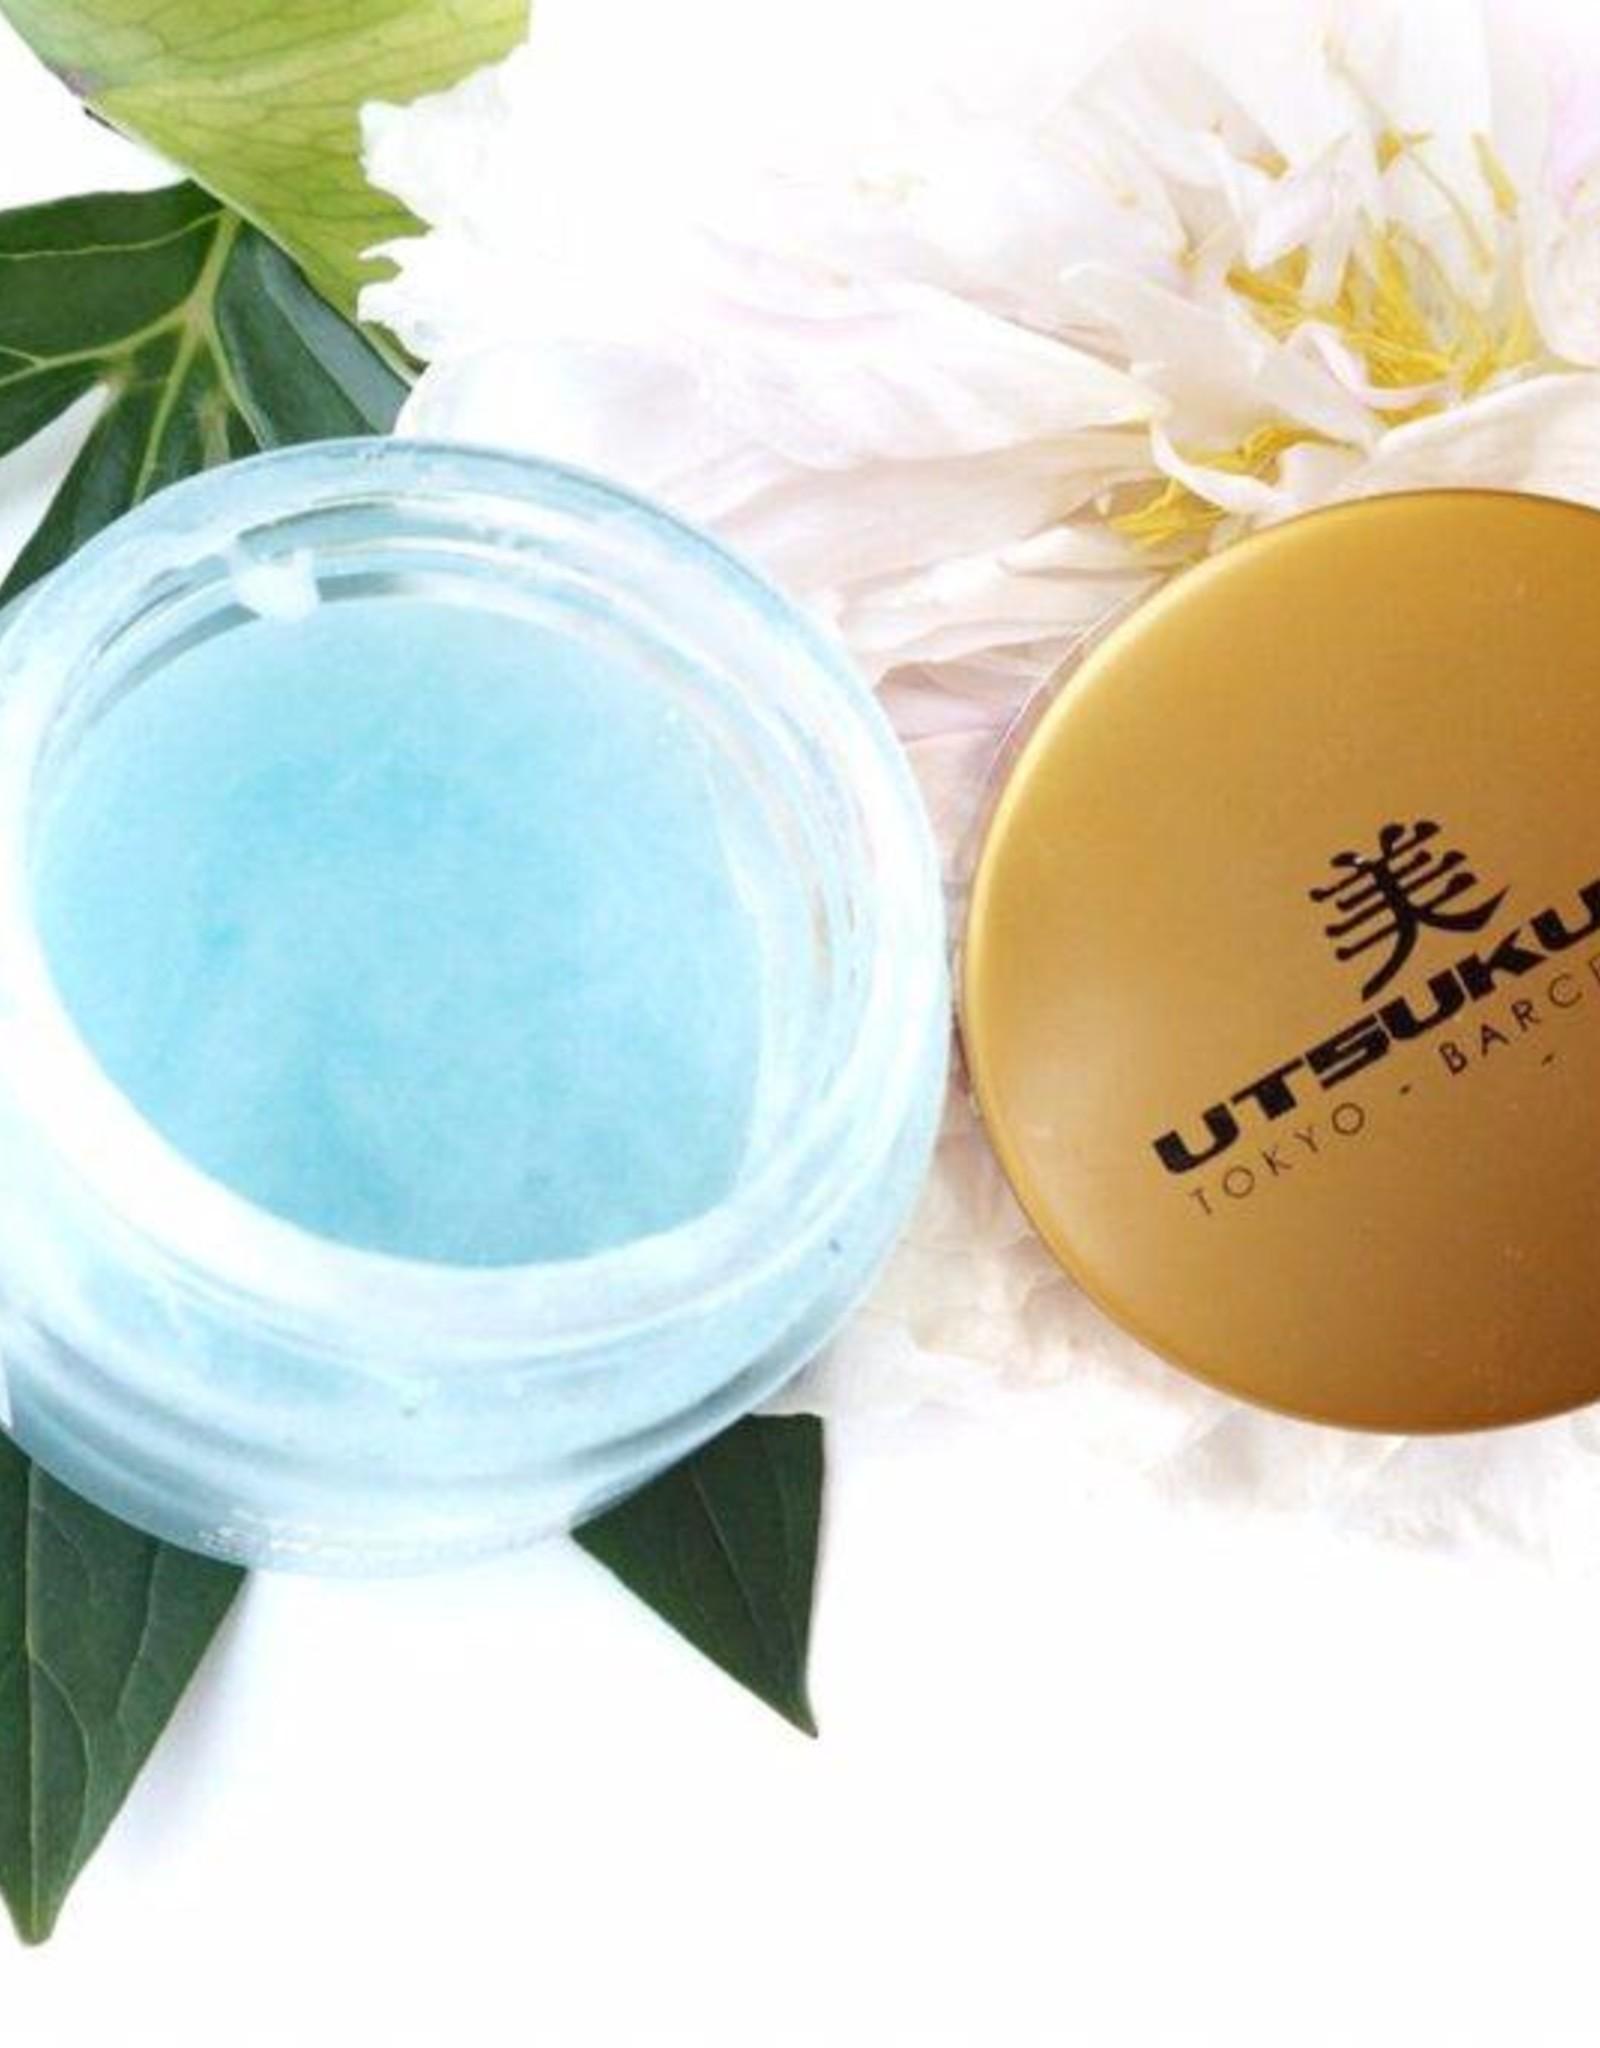 Utsukusy Perfect Skin gel creme 50ml